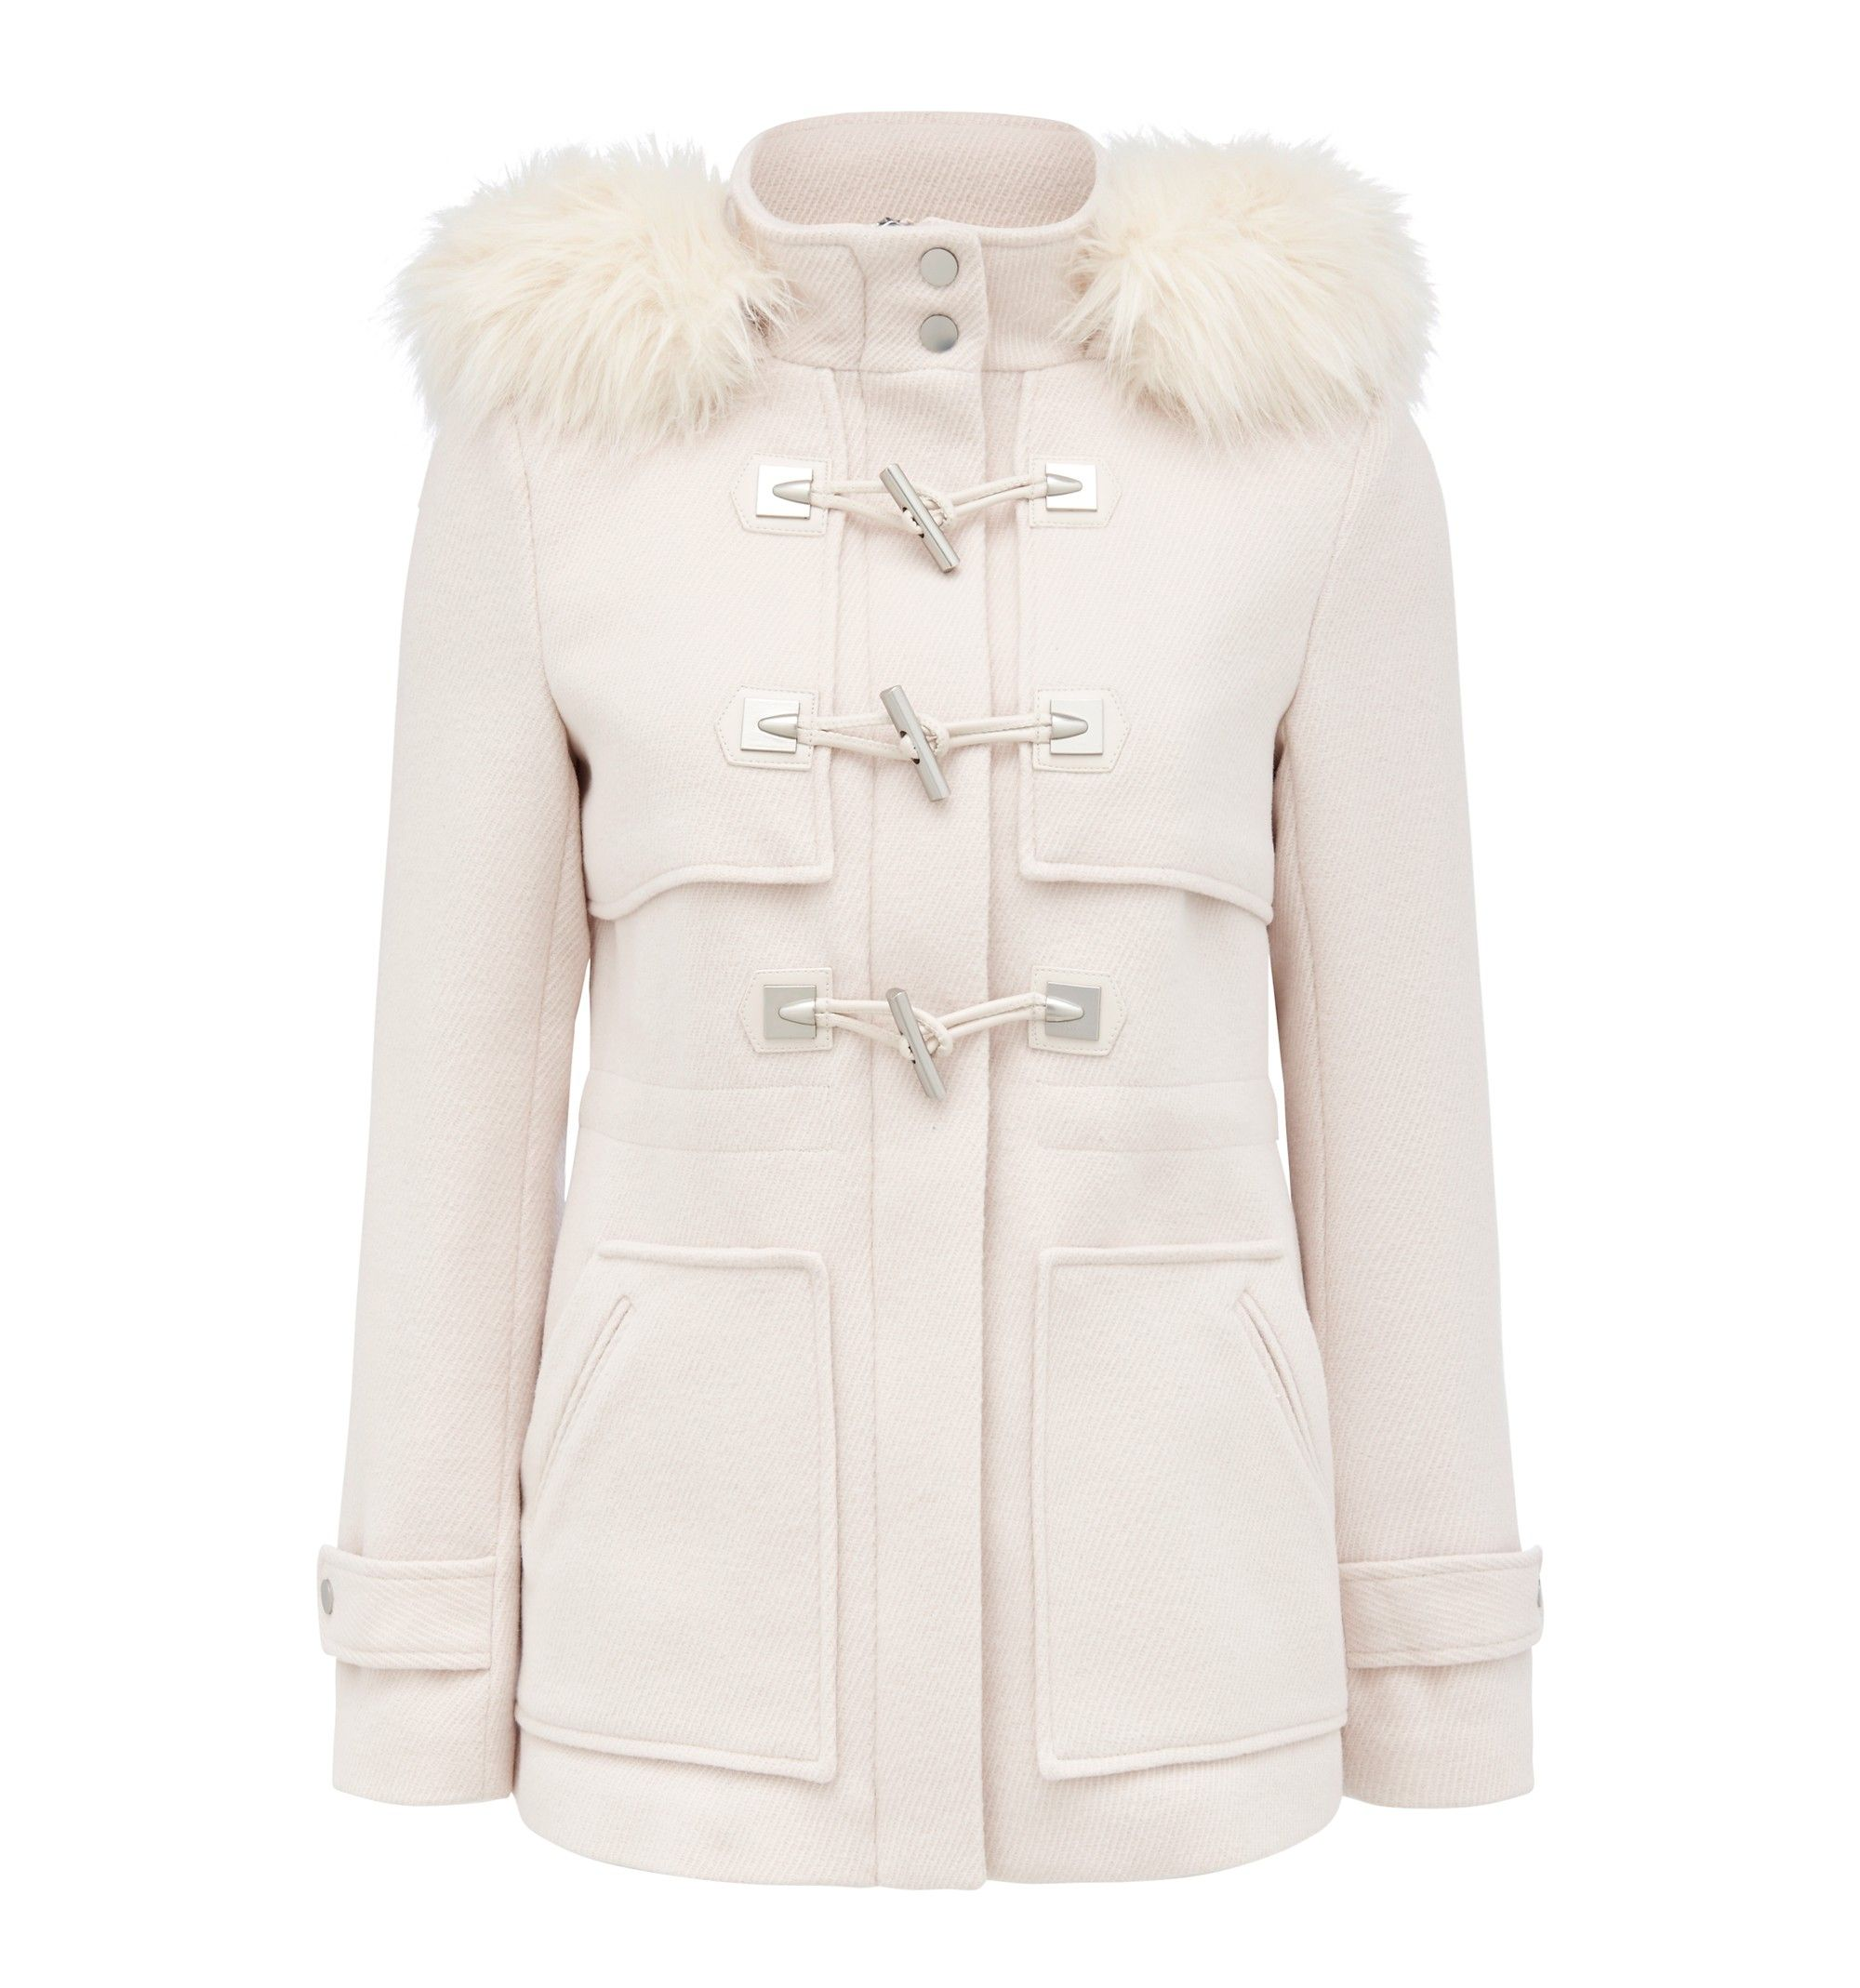 Clara swing duffle coat Cream - Womens Fashion | Forever New ...